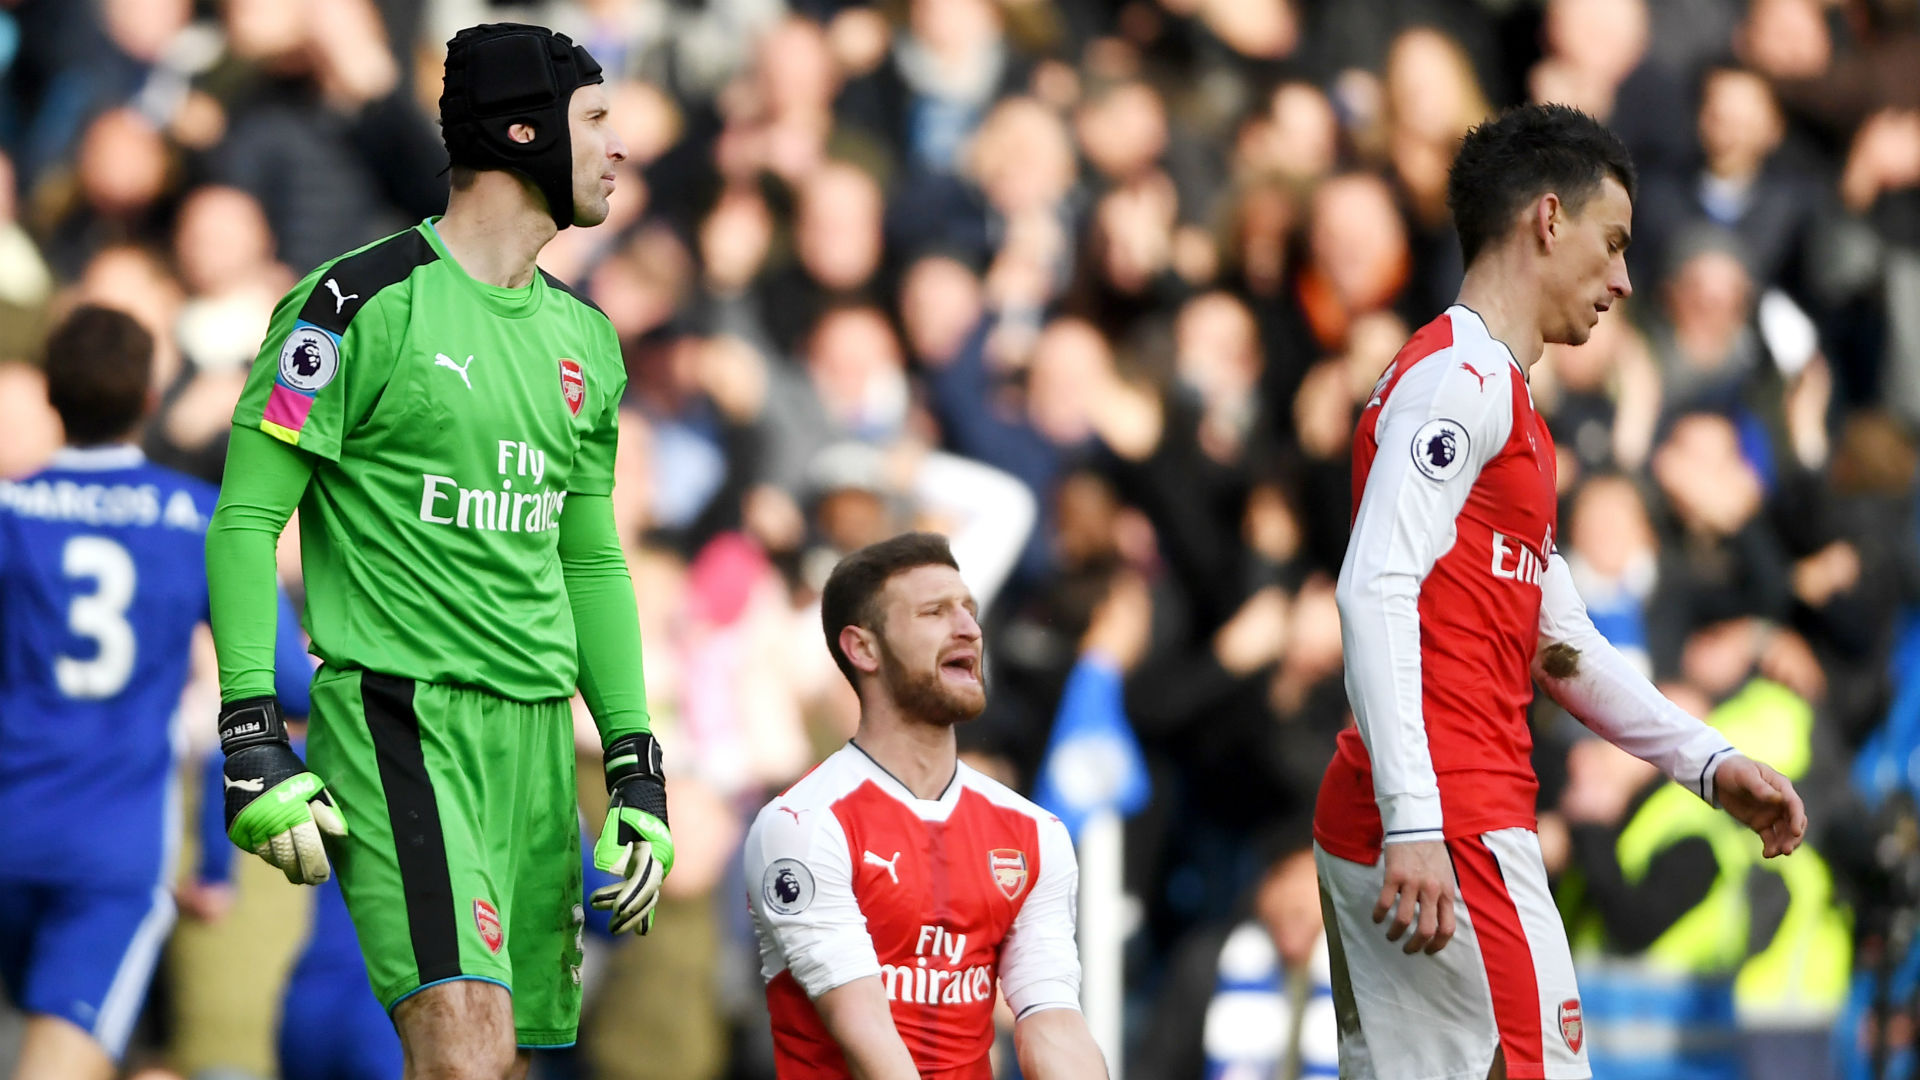 Arsenal Chelsea Cech Mustafi Koscielny